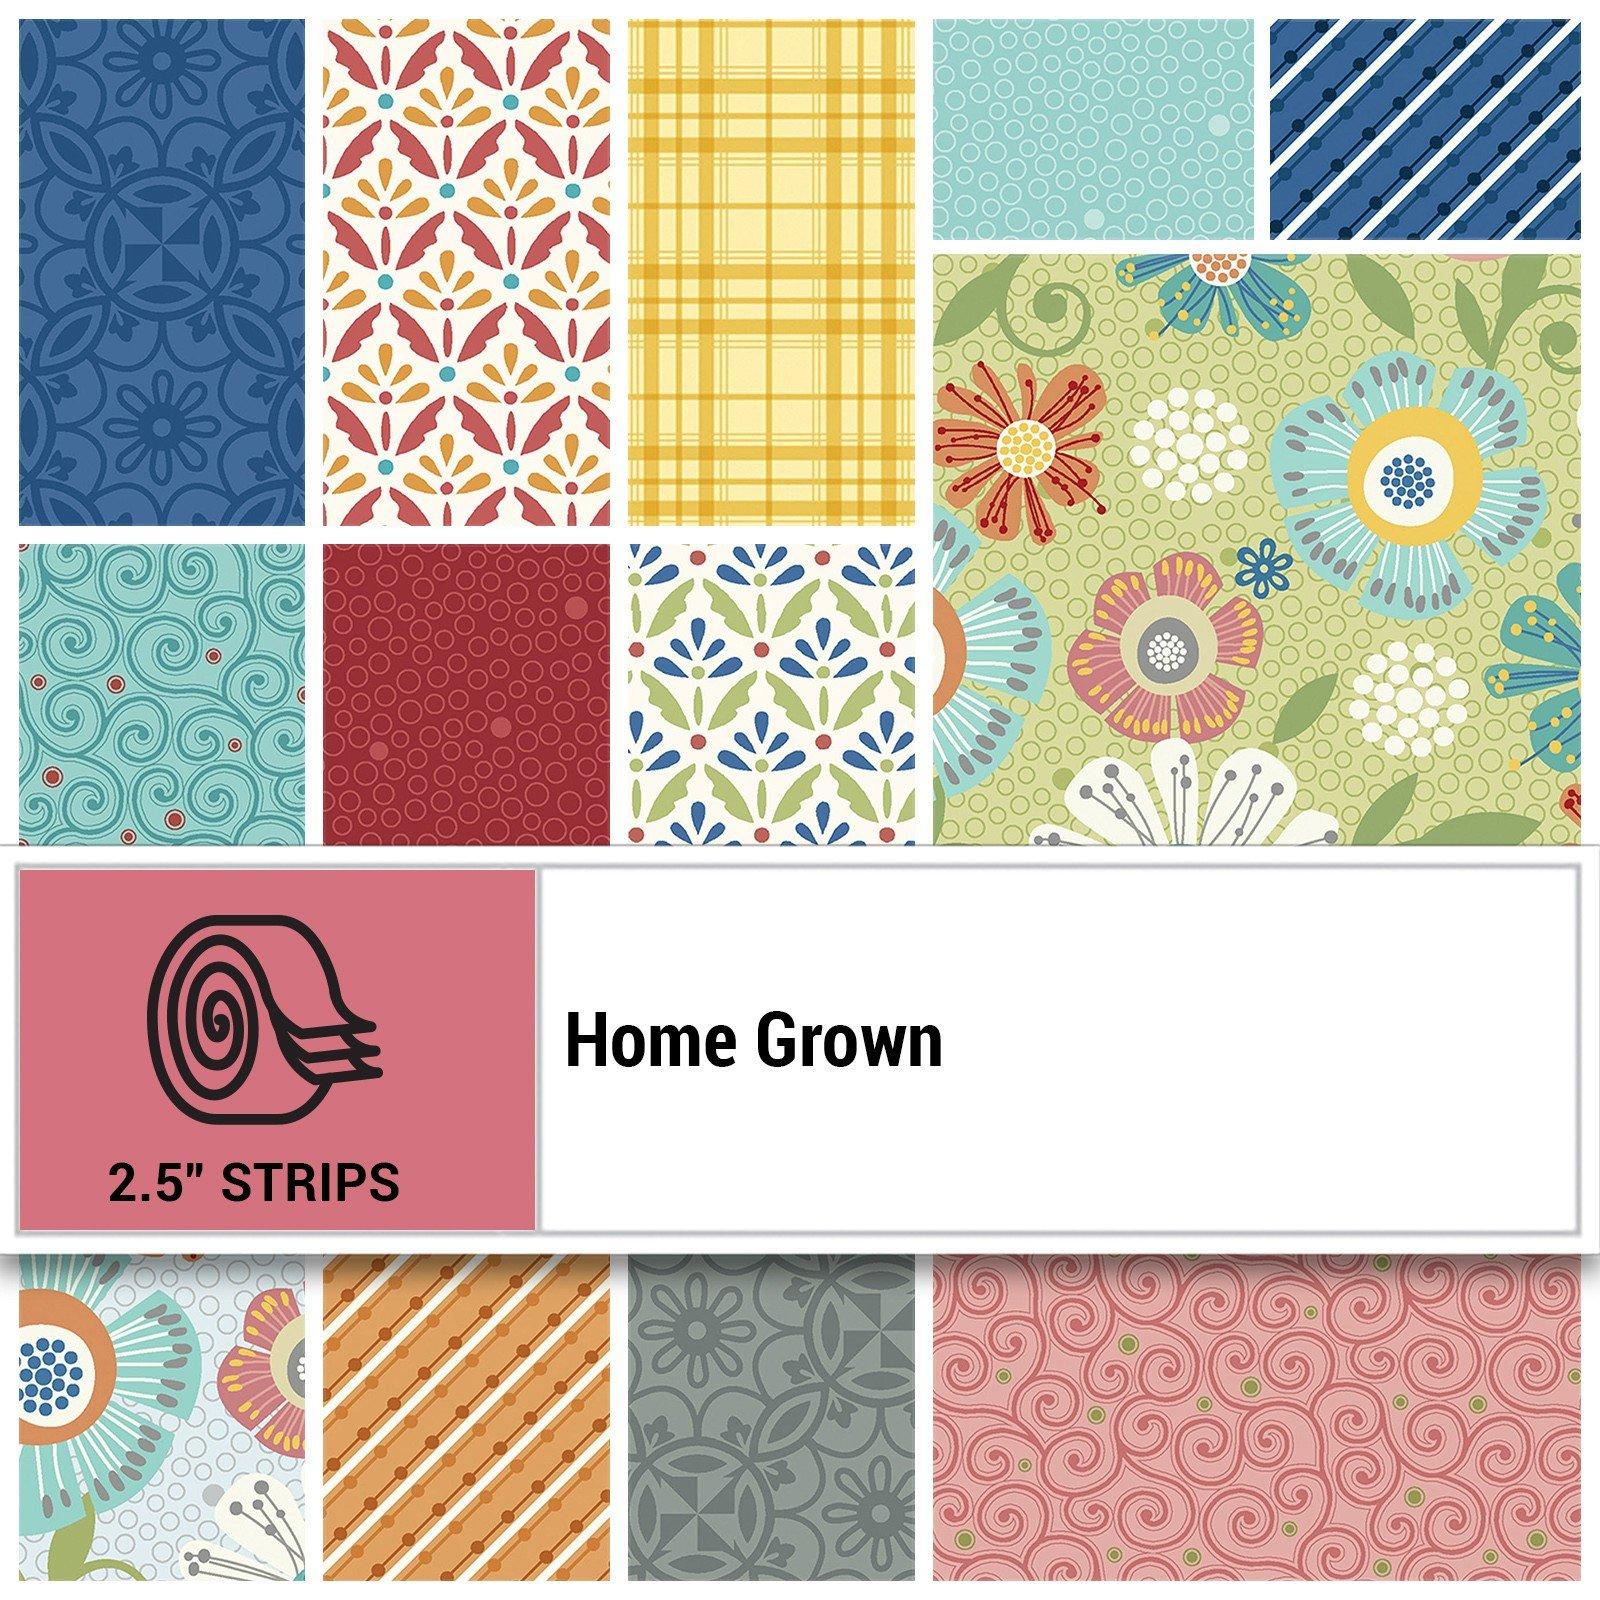 Home Grown - 2.5 Strips